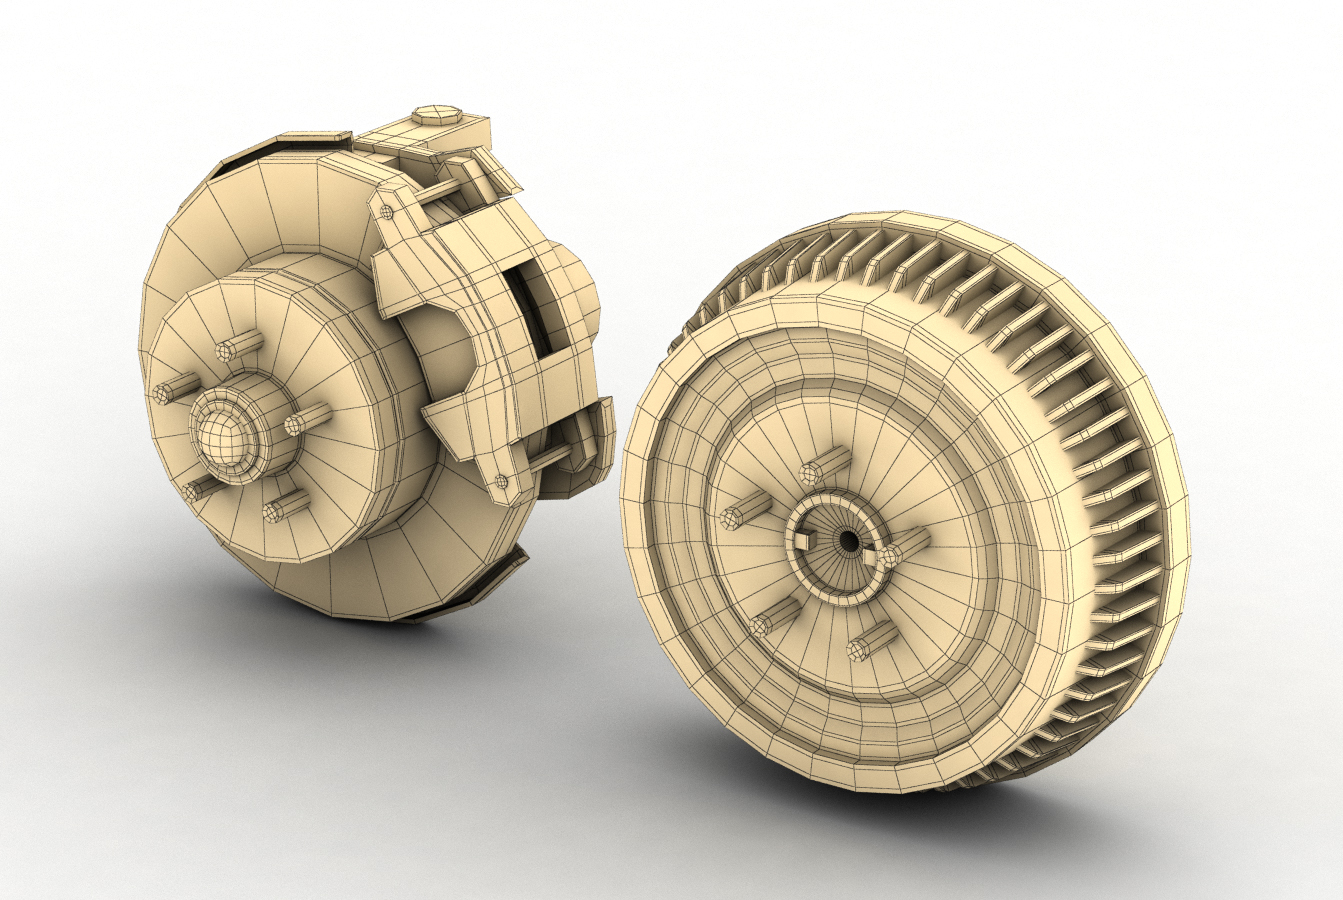 car and truck brake set 3d model 3ds max fbx obj 282207